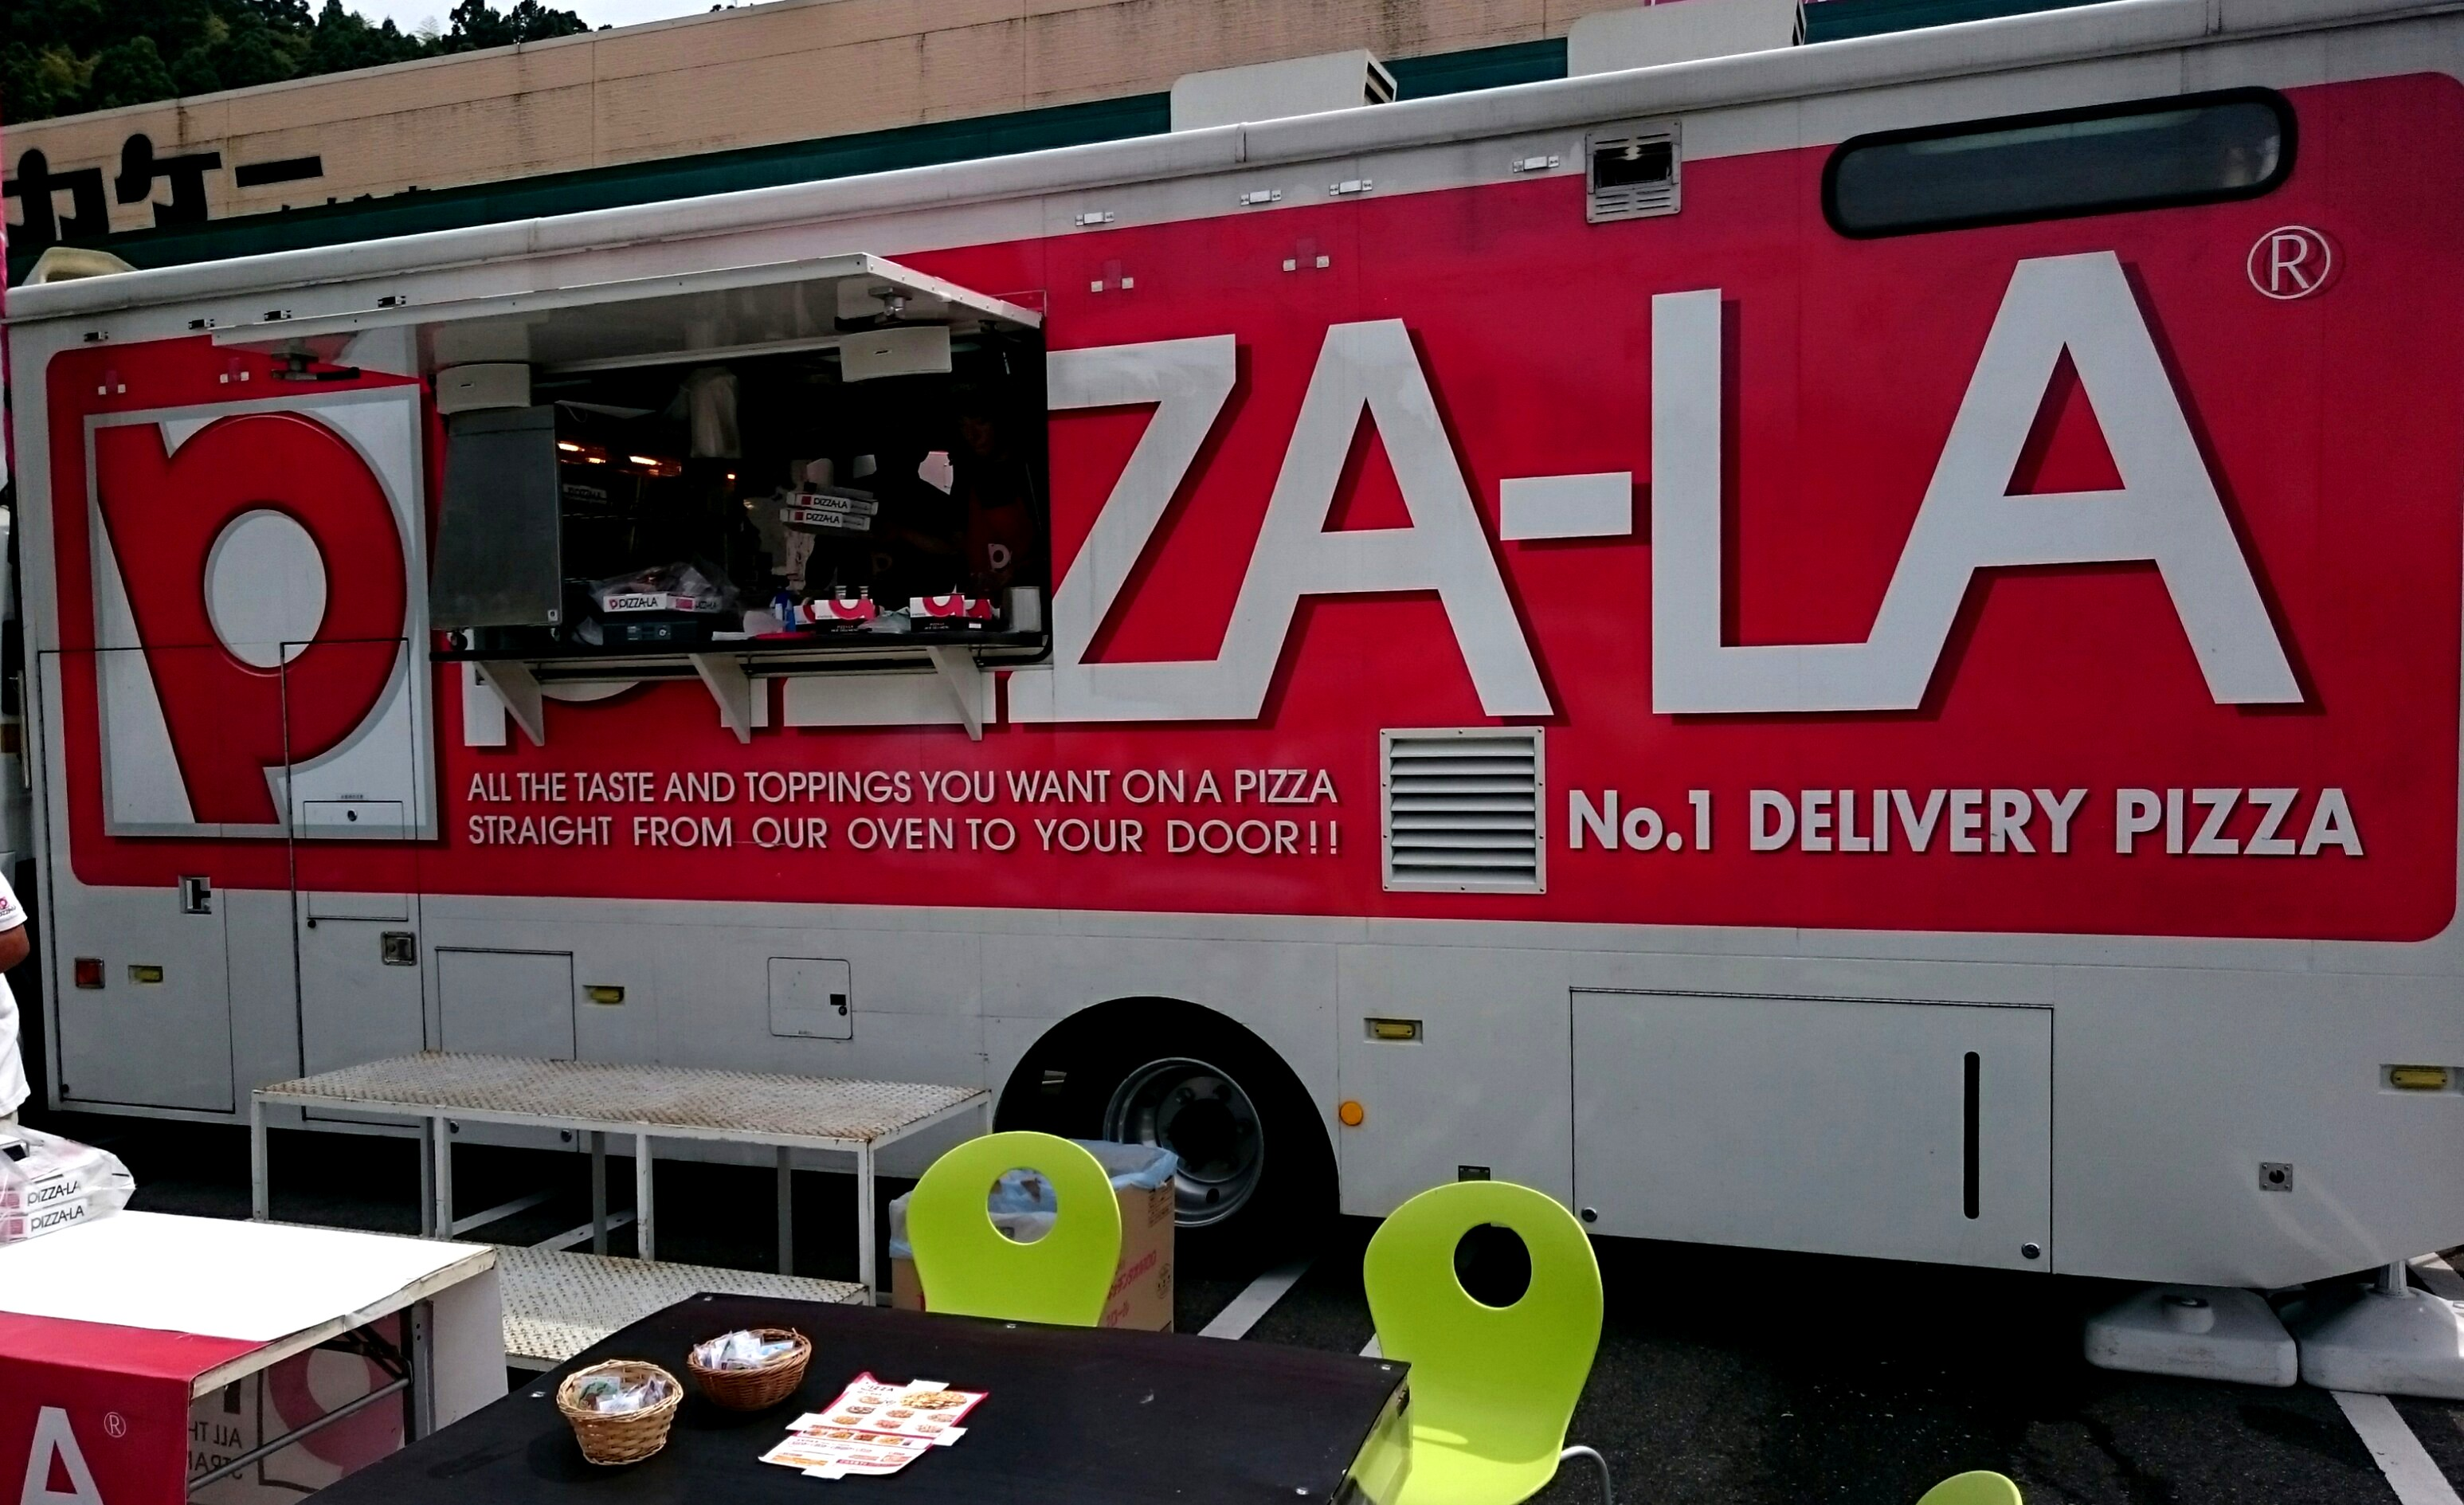 20160702-PIZZA-LA-E01.jpg